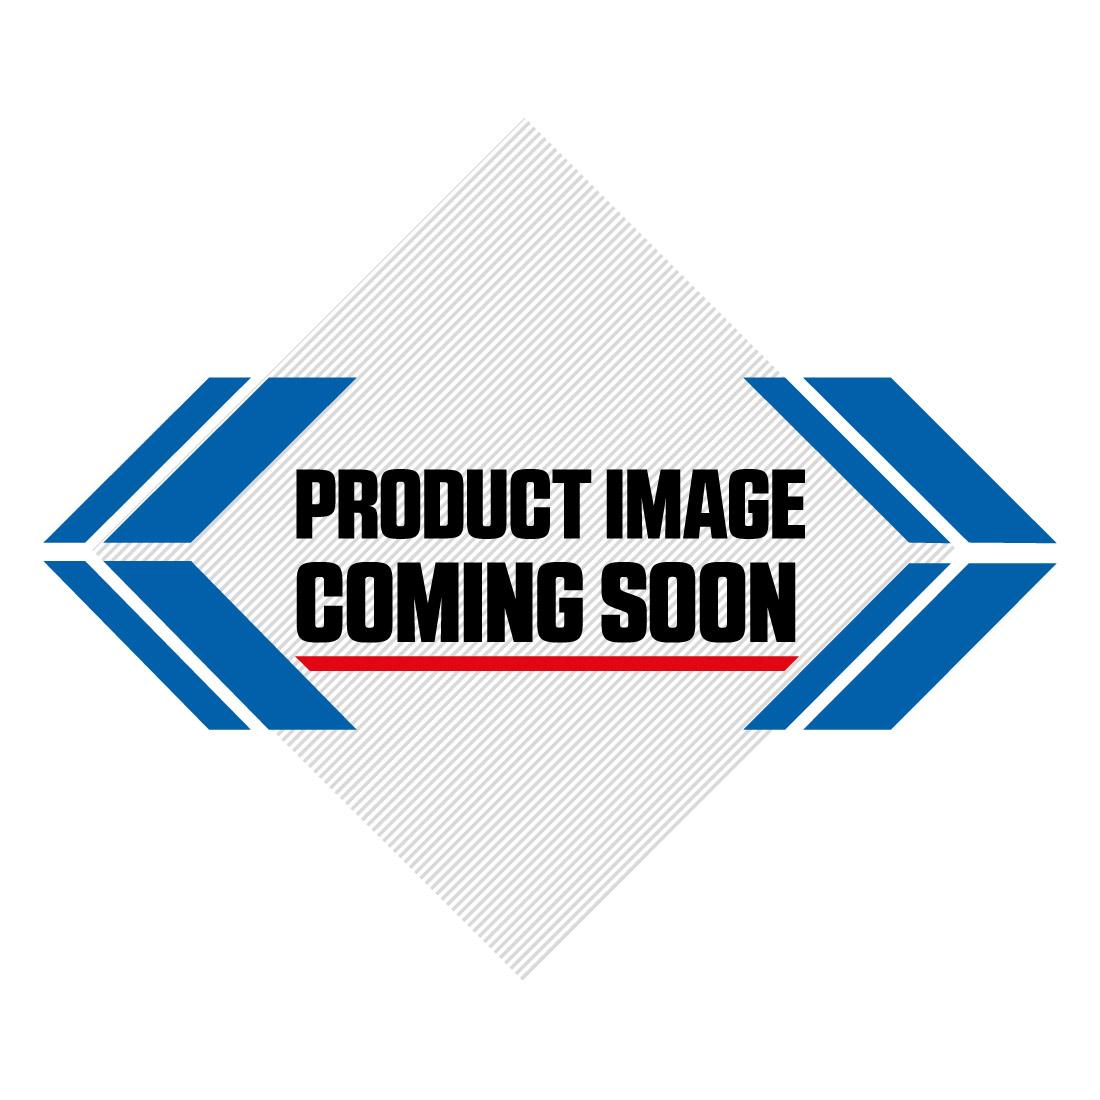 Honda Plastic Kit CRF 250 (14-17) CRF 450 (13-16) OEM Factory Image-1>